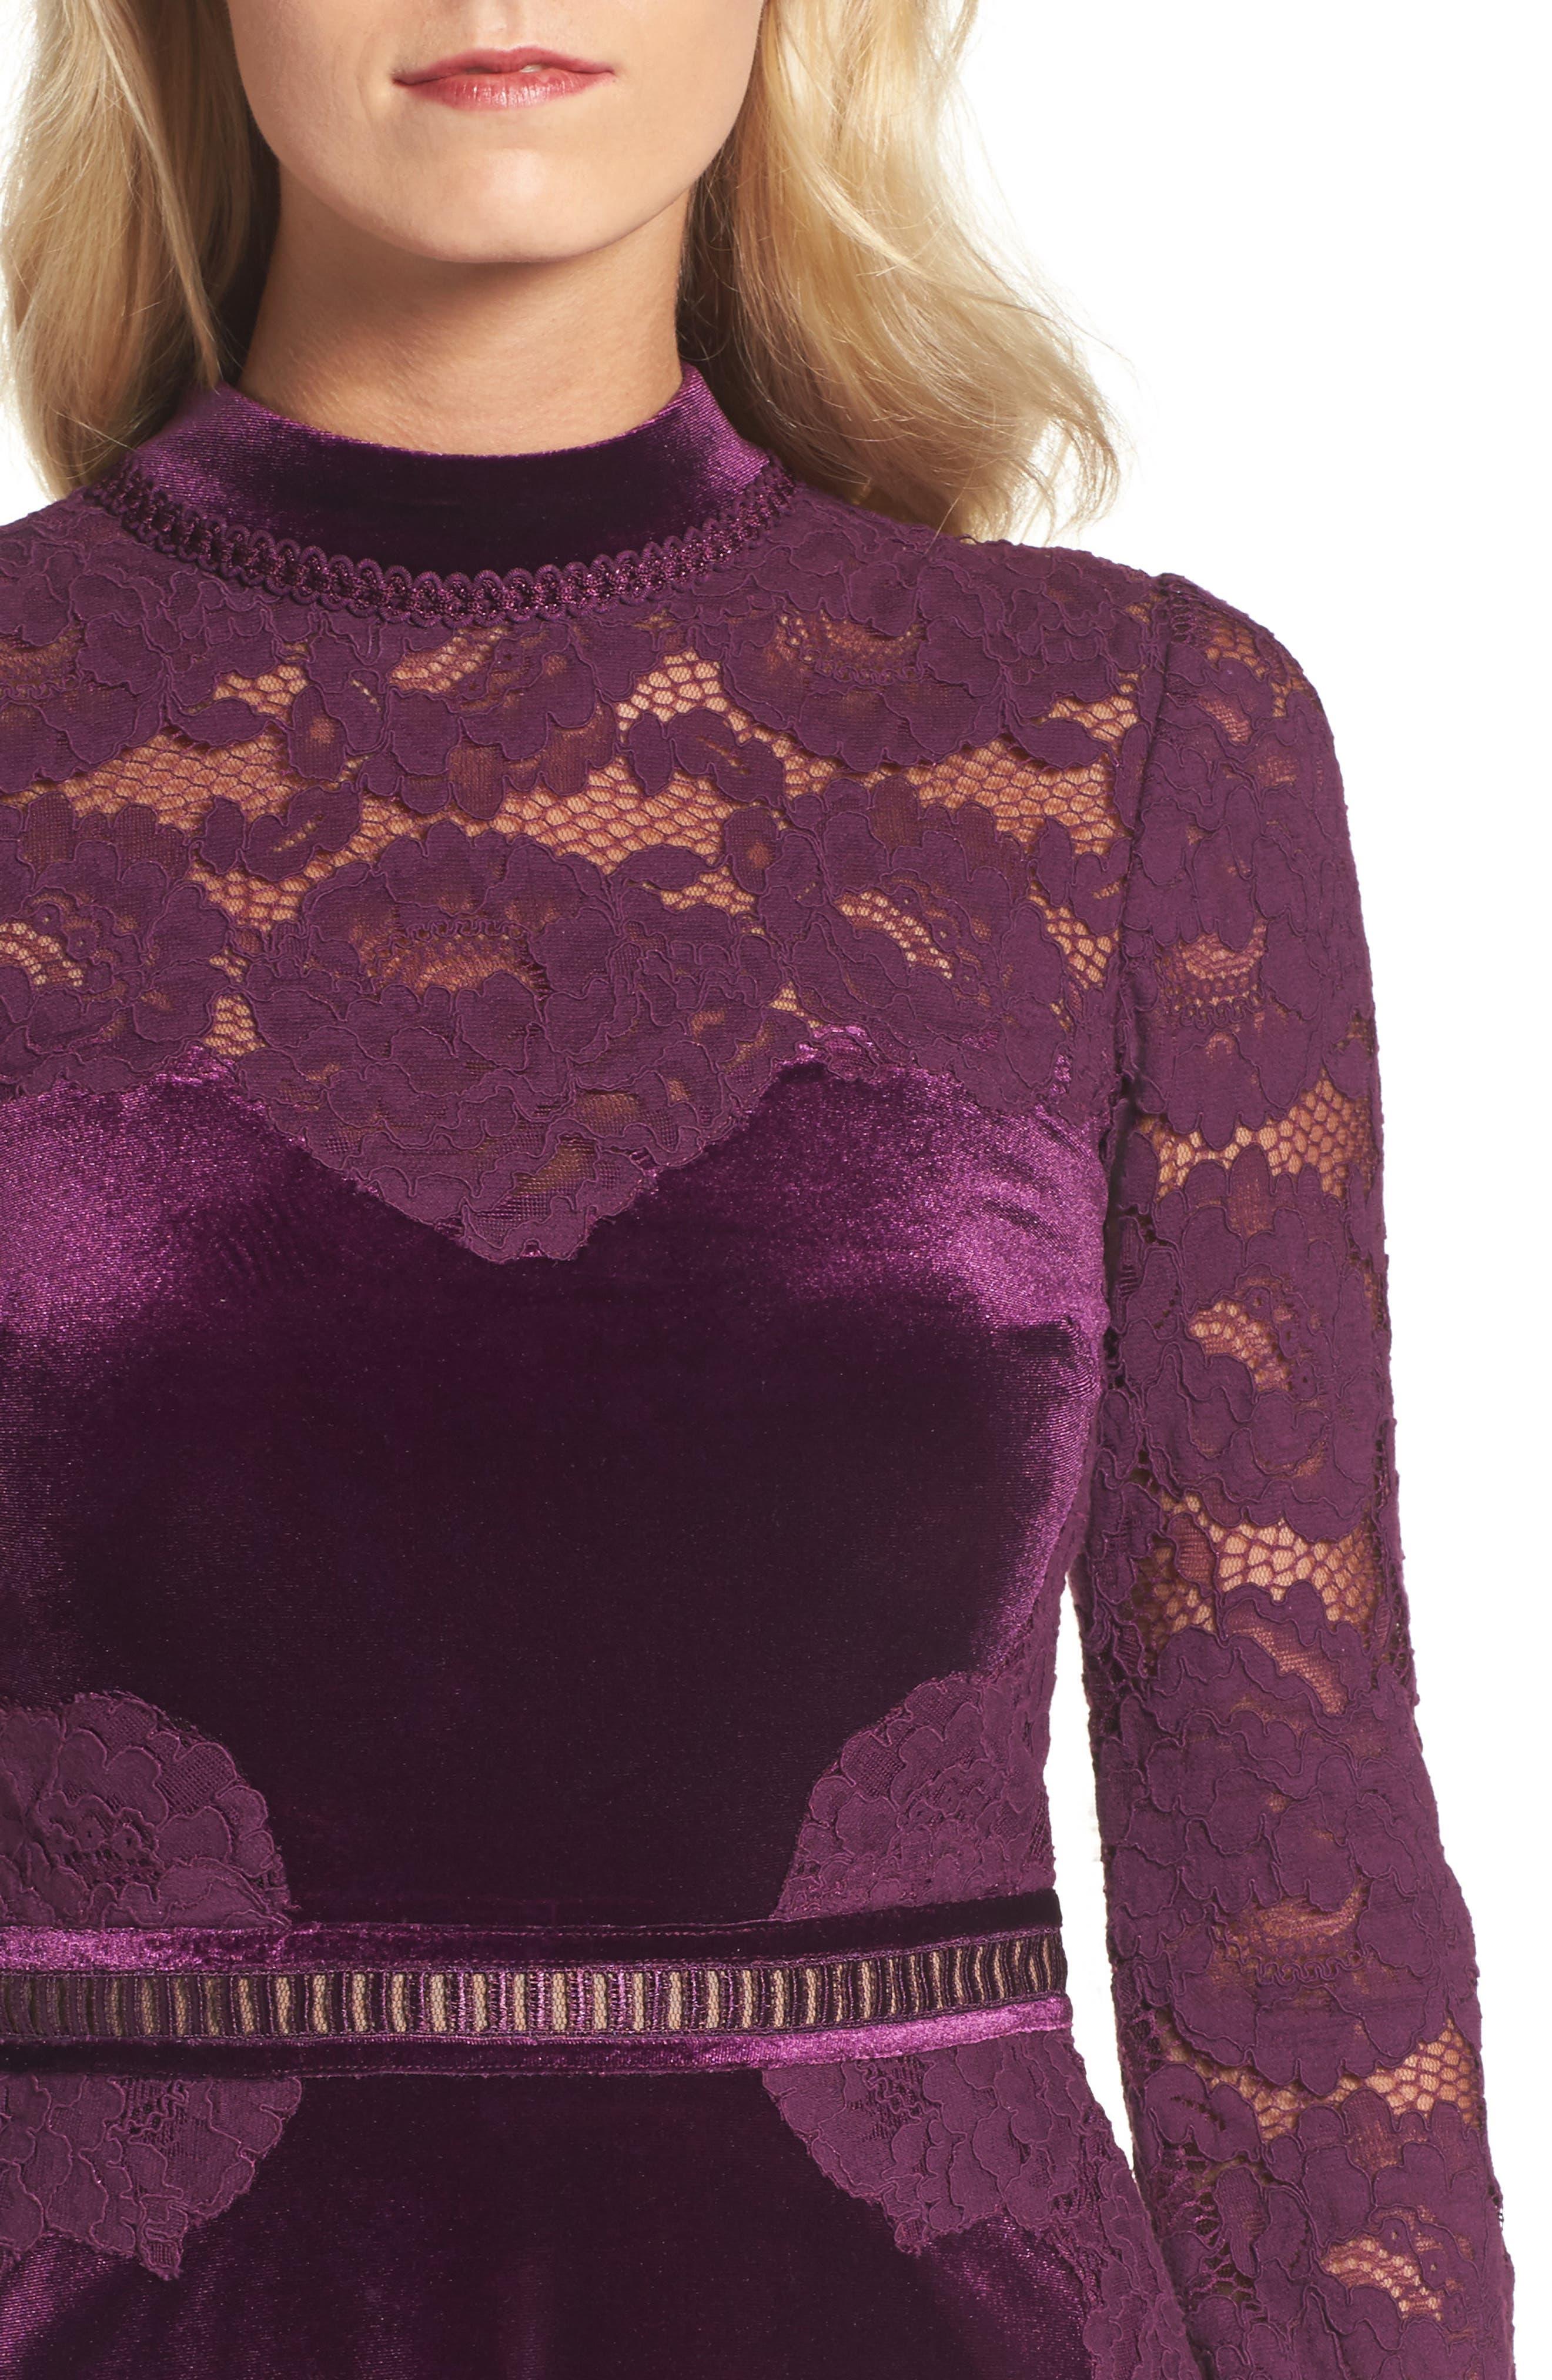 High Neck Lace & Velvet Cocktail Dress,                             Alternate thumbnail 4, color,                             572